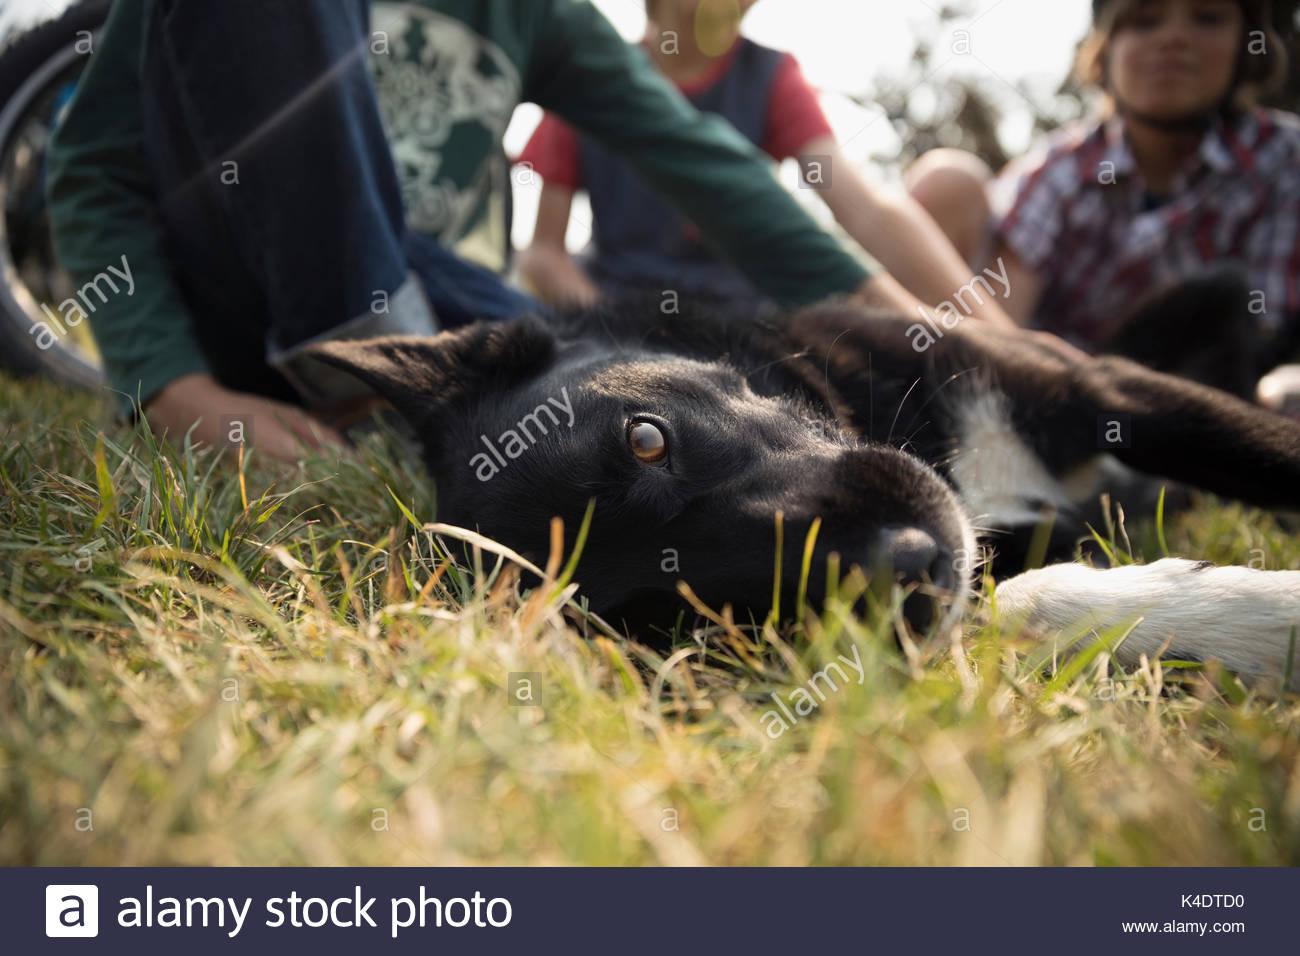 Noir et blanc portrait dog laying in grass Photo Stock